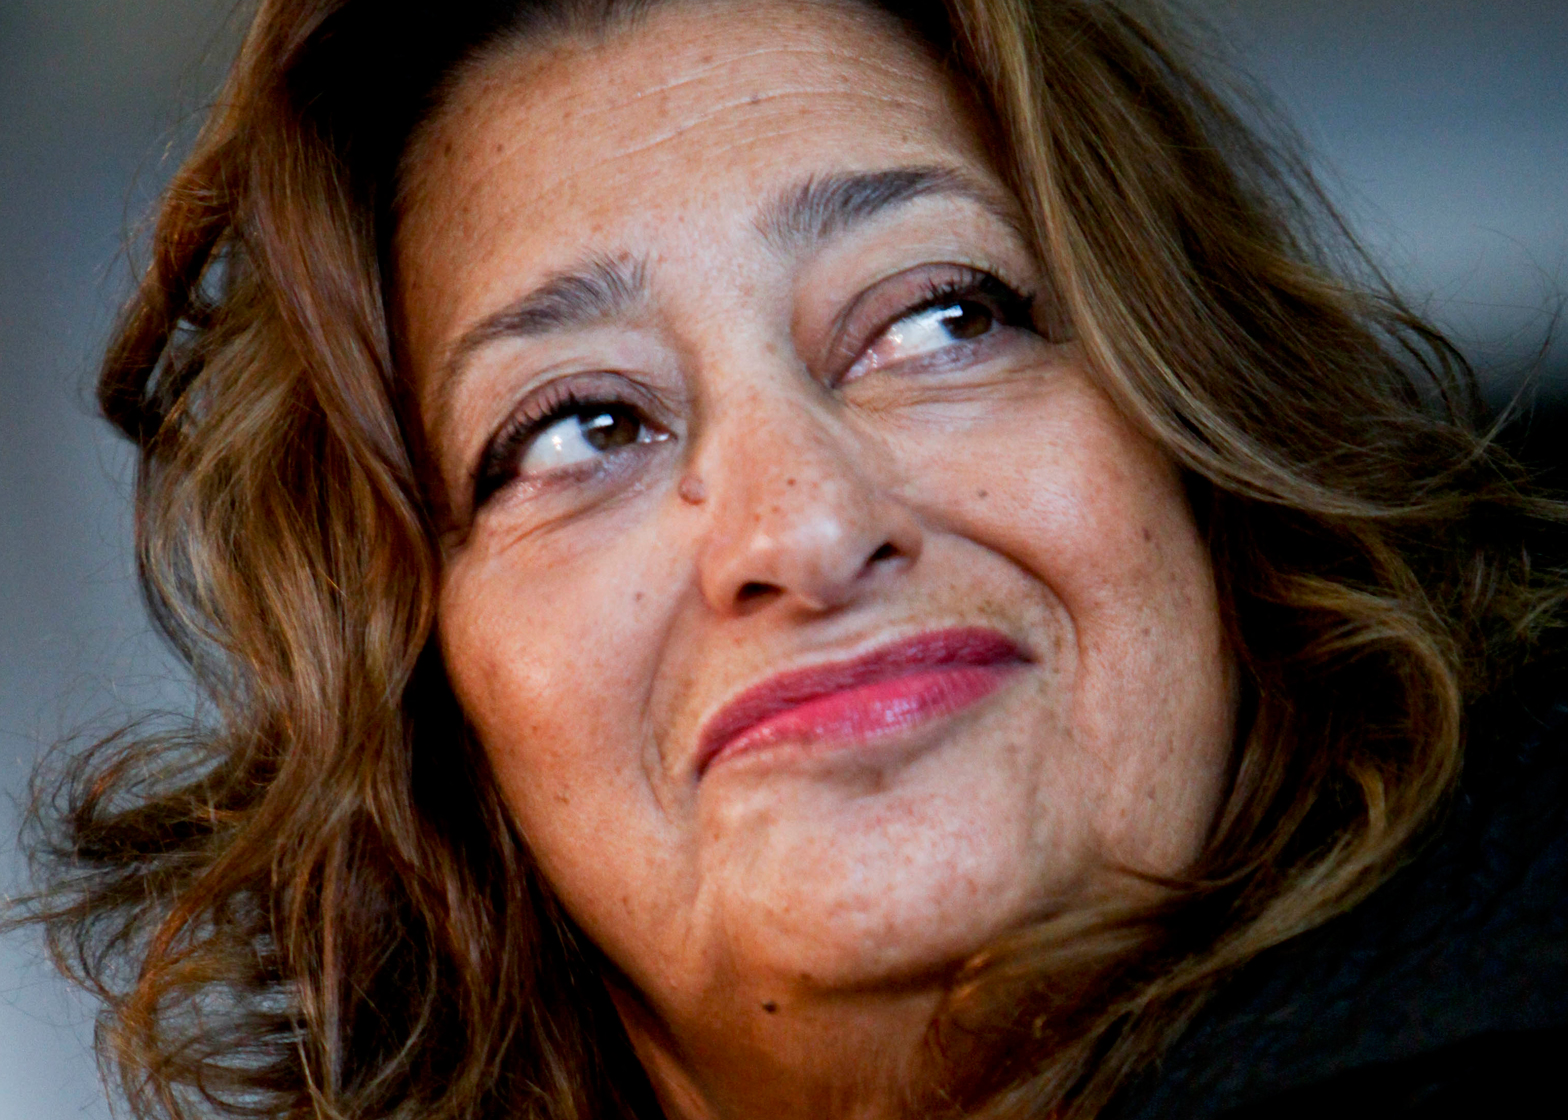 Zaha Hadid portrait by Simone Cecchetti